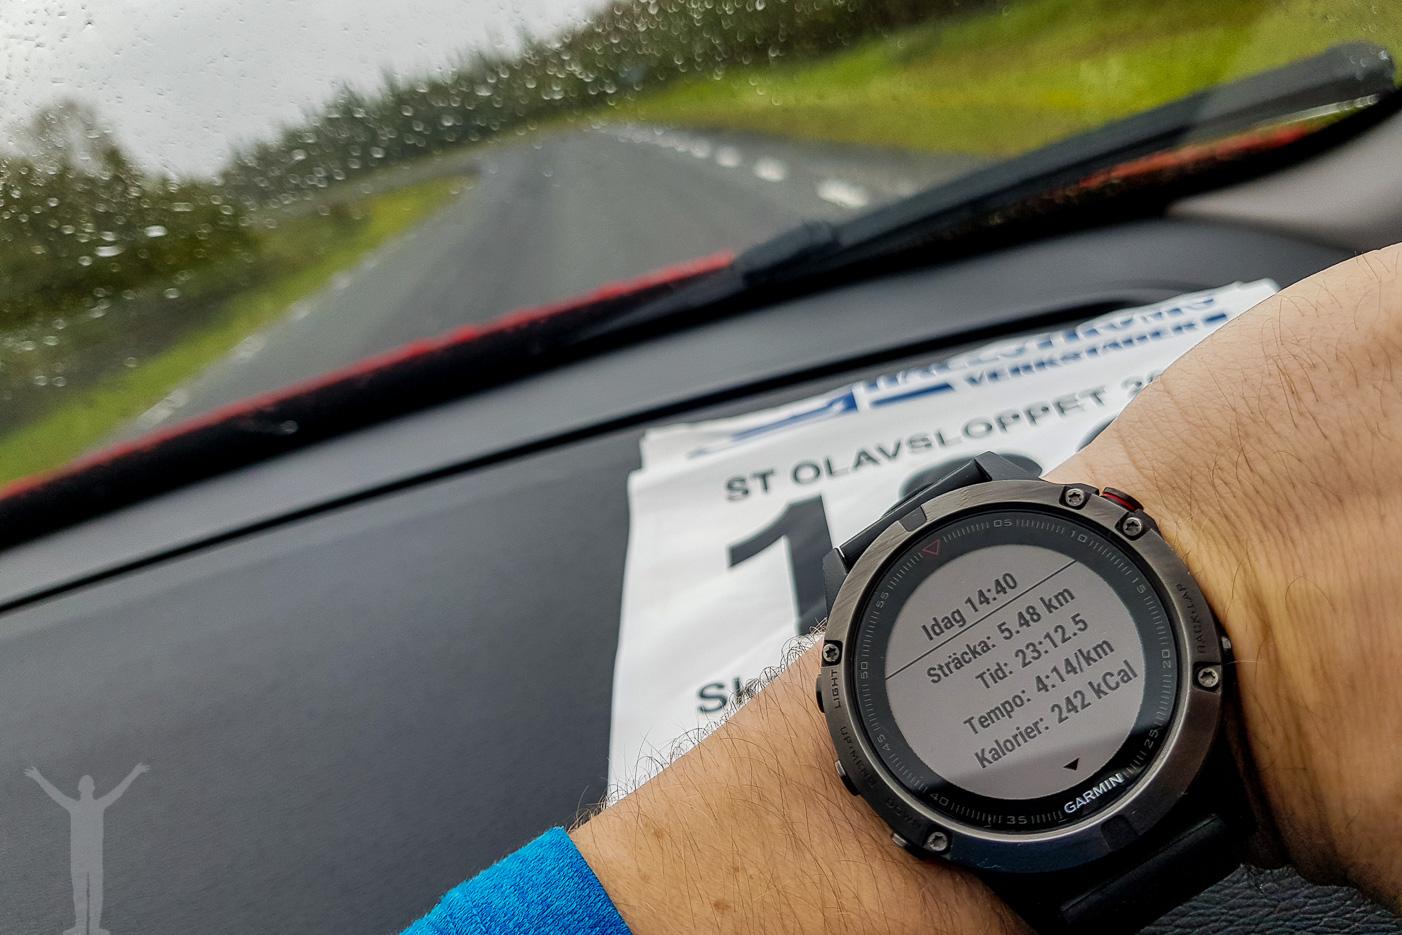 Ny fin 5-kilometerssträcka!